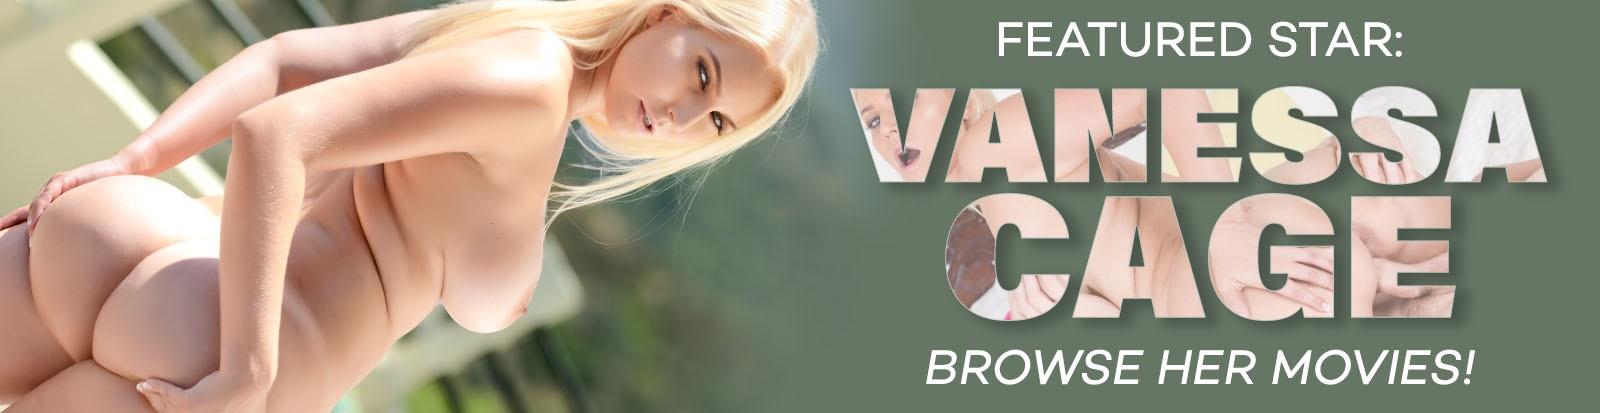 Watch Vanessa Cage porn videos on Unlimited.